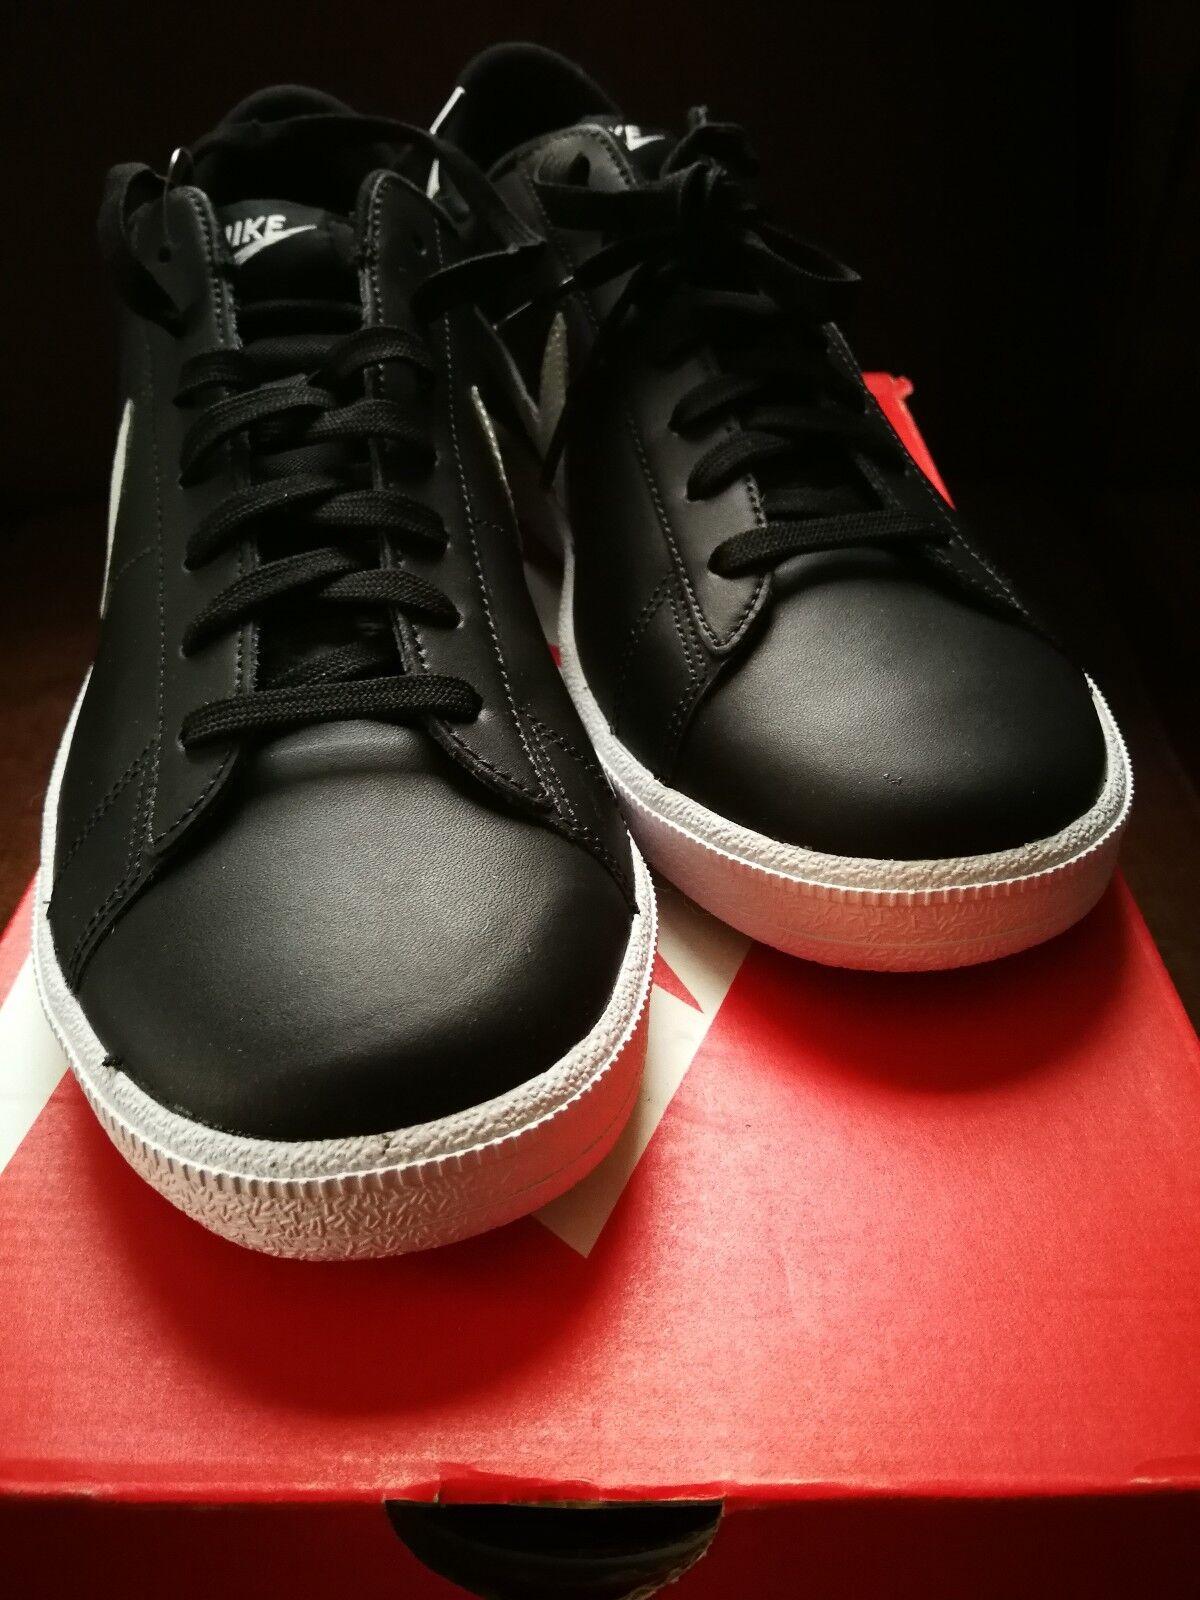 NIKE Vintage Classic Style Black Tennis Kicks